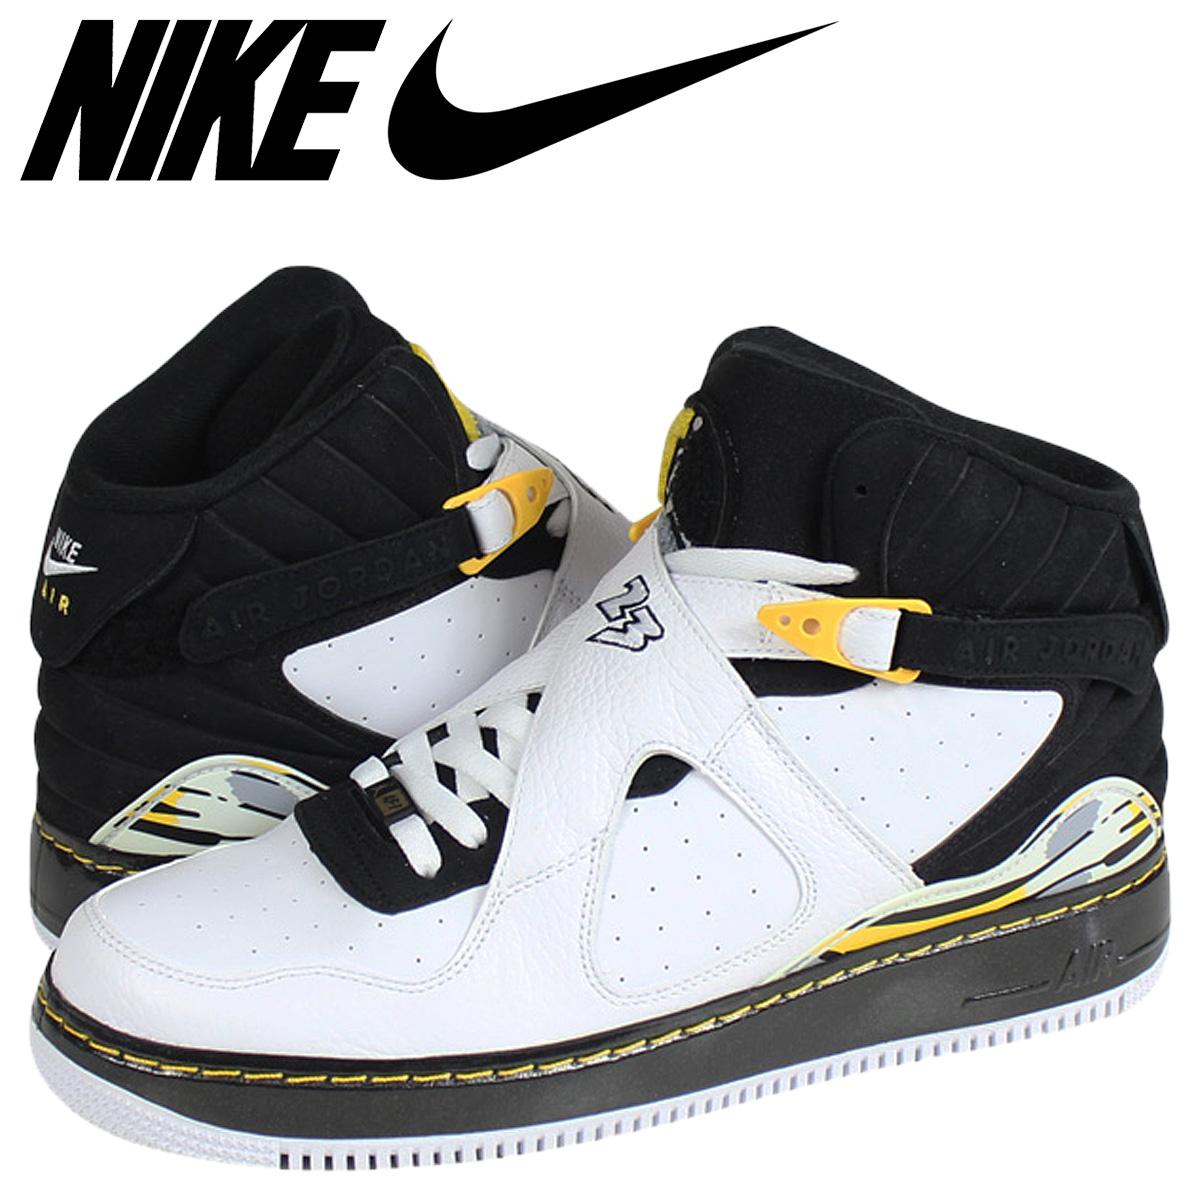 premium selection 77e93 d69b7 NIKE Nike Air Jordan sneakers AIR JORDAN FUSION 8 Air Jordan fusion 8  384,522-102 ...